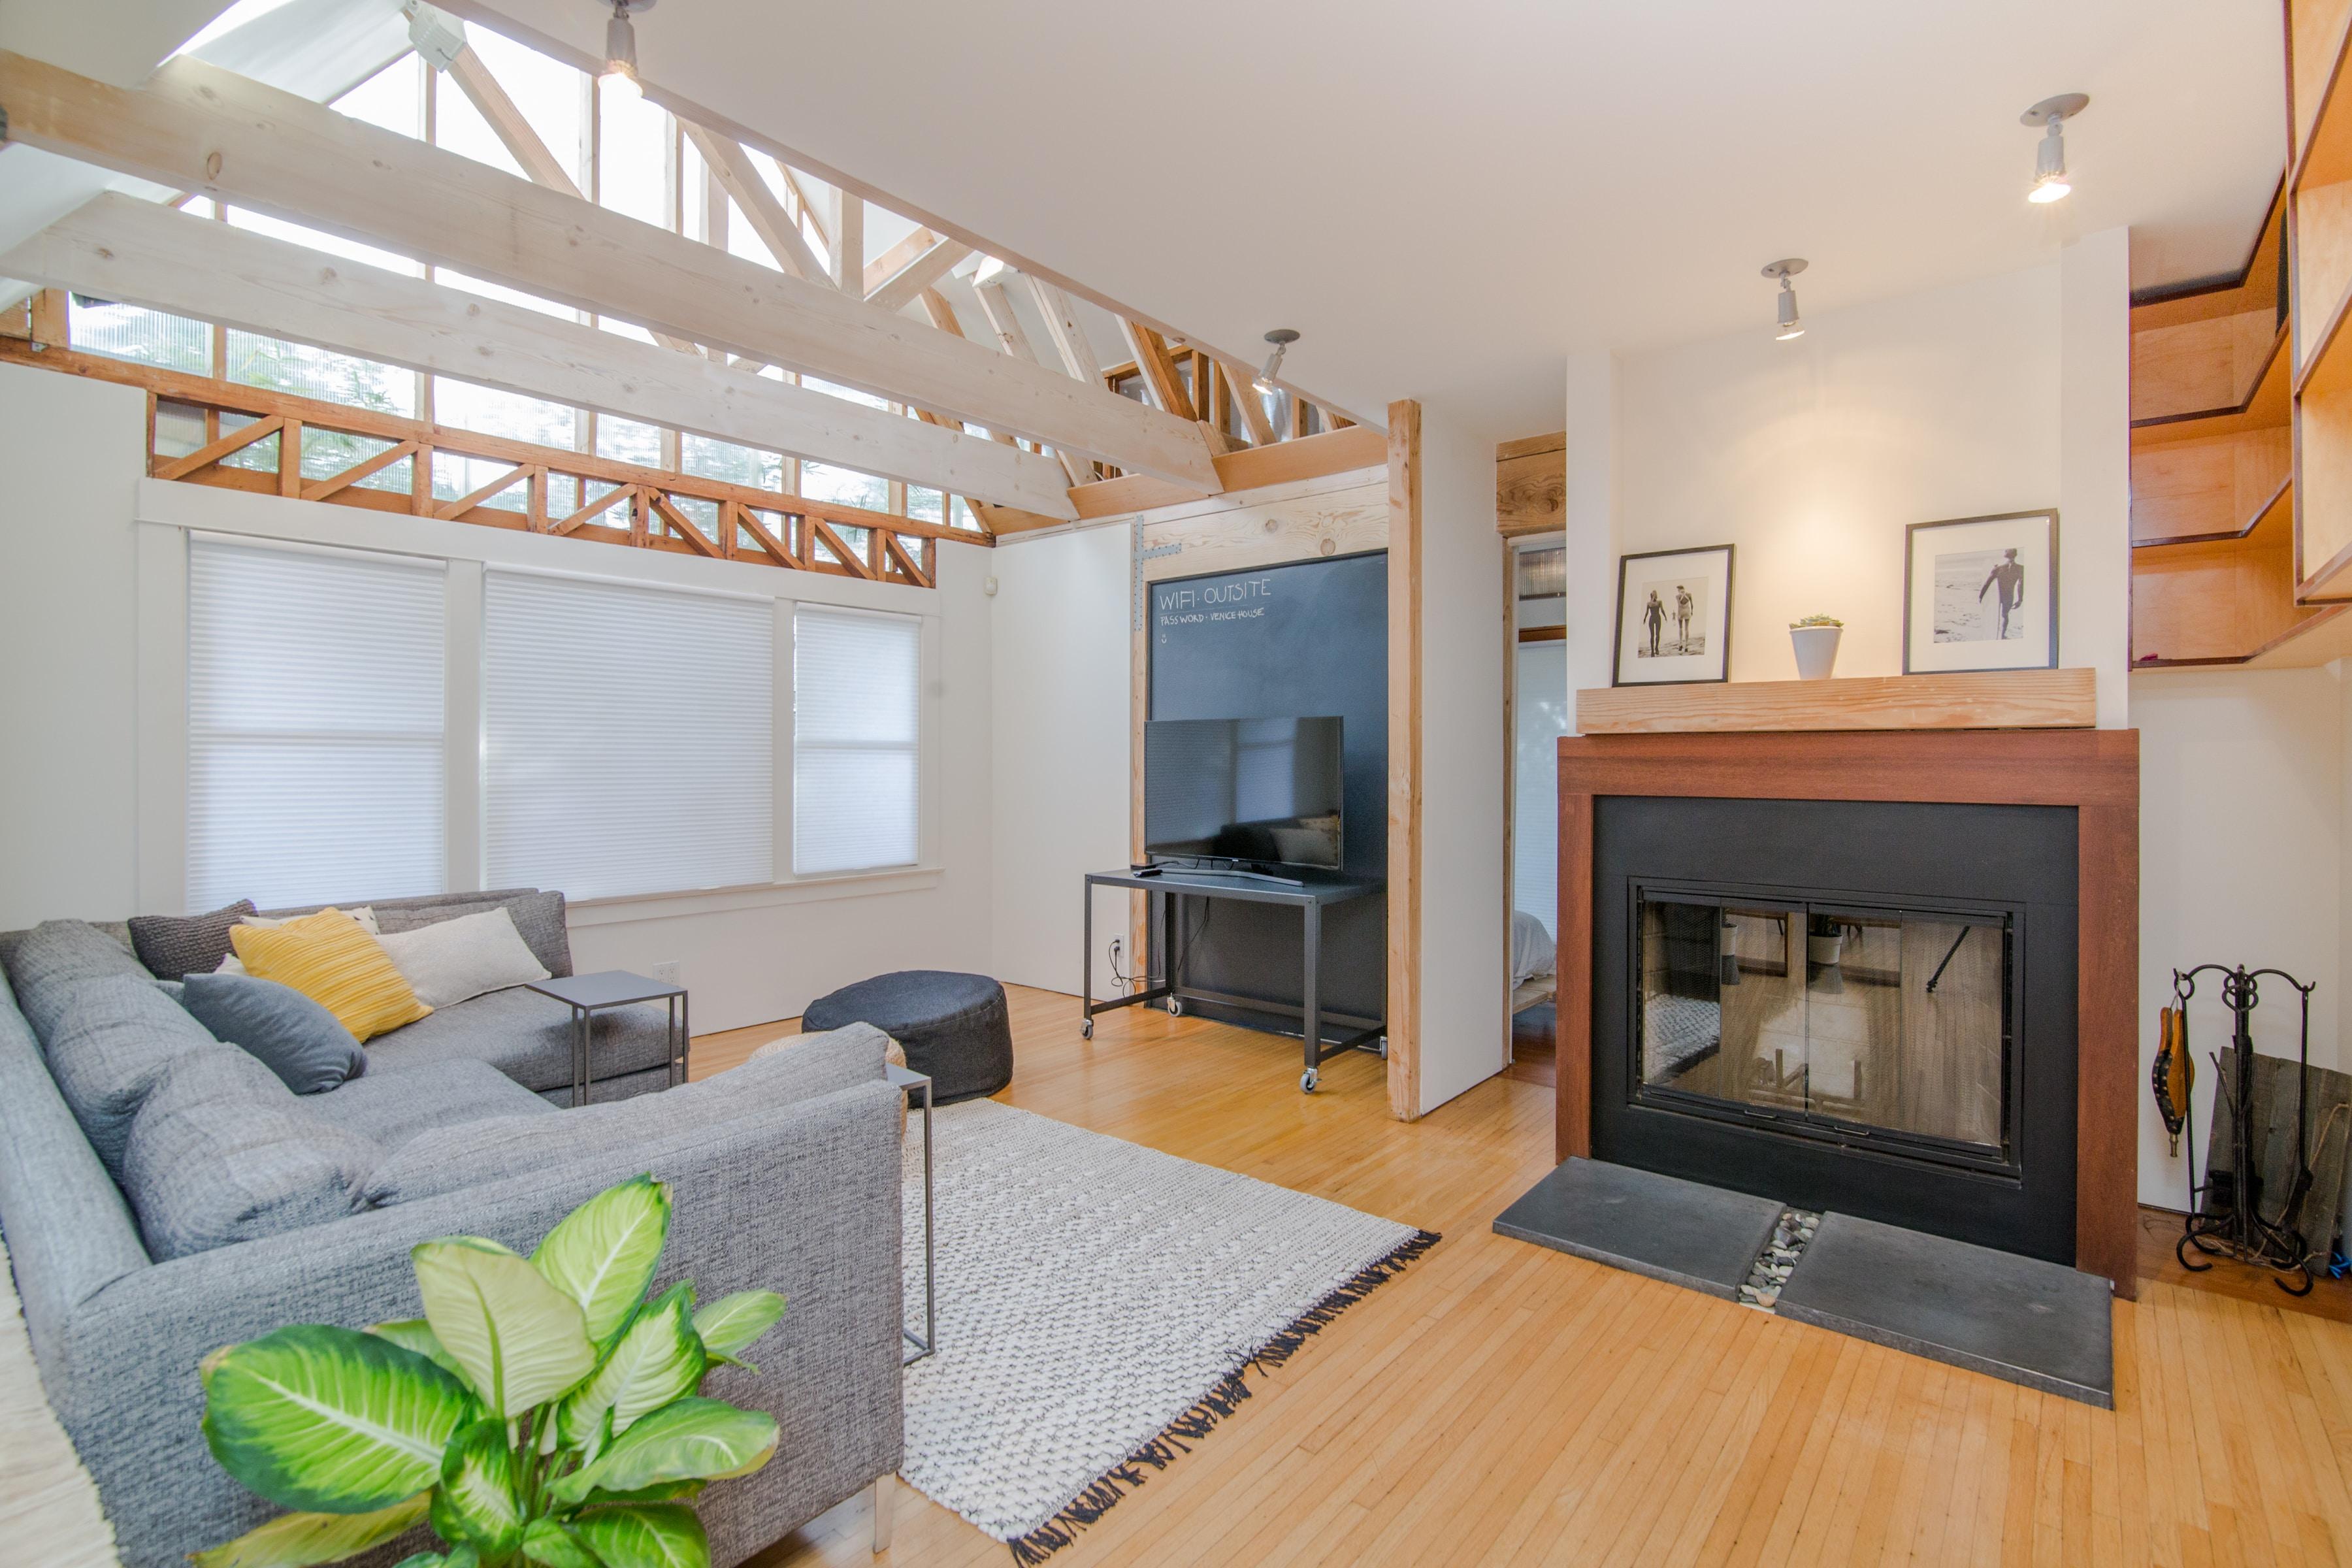 Hoe kun je je huis verduurzamen?